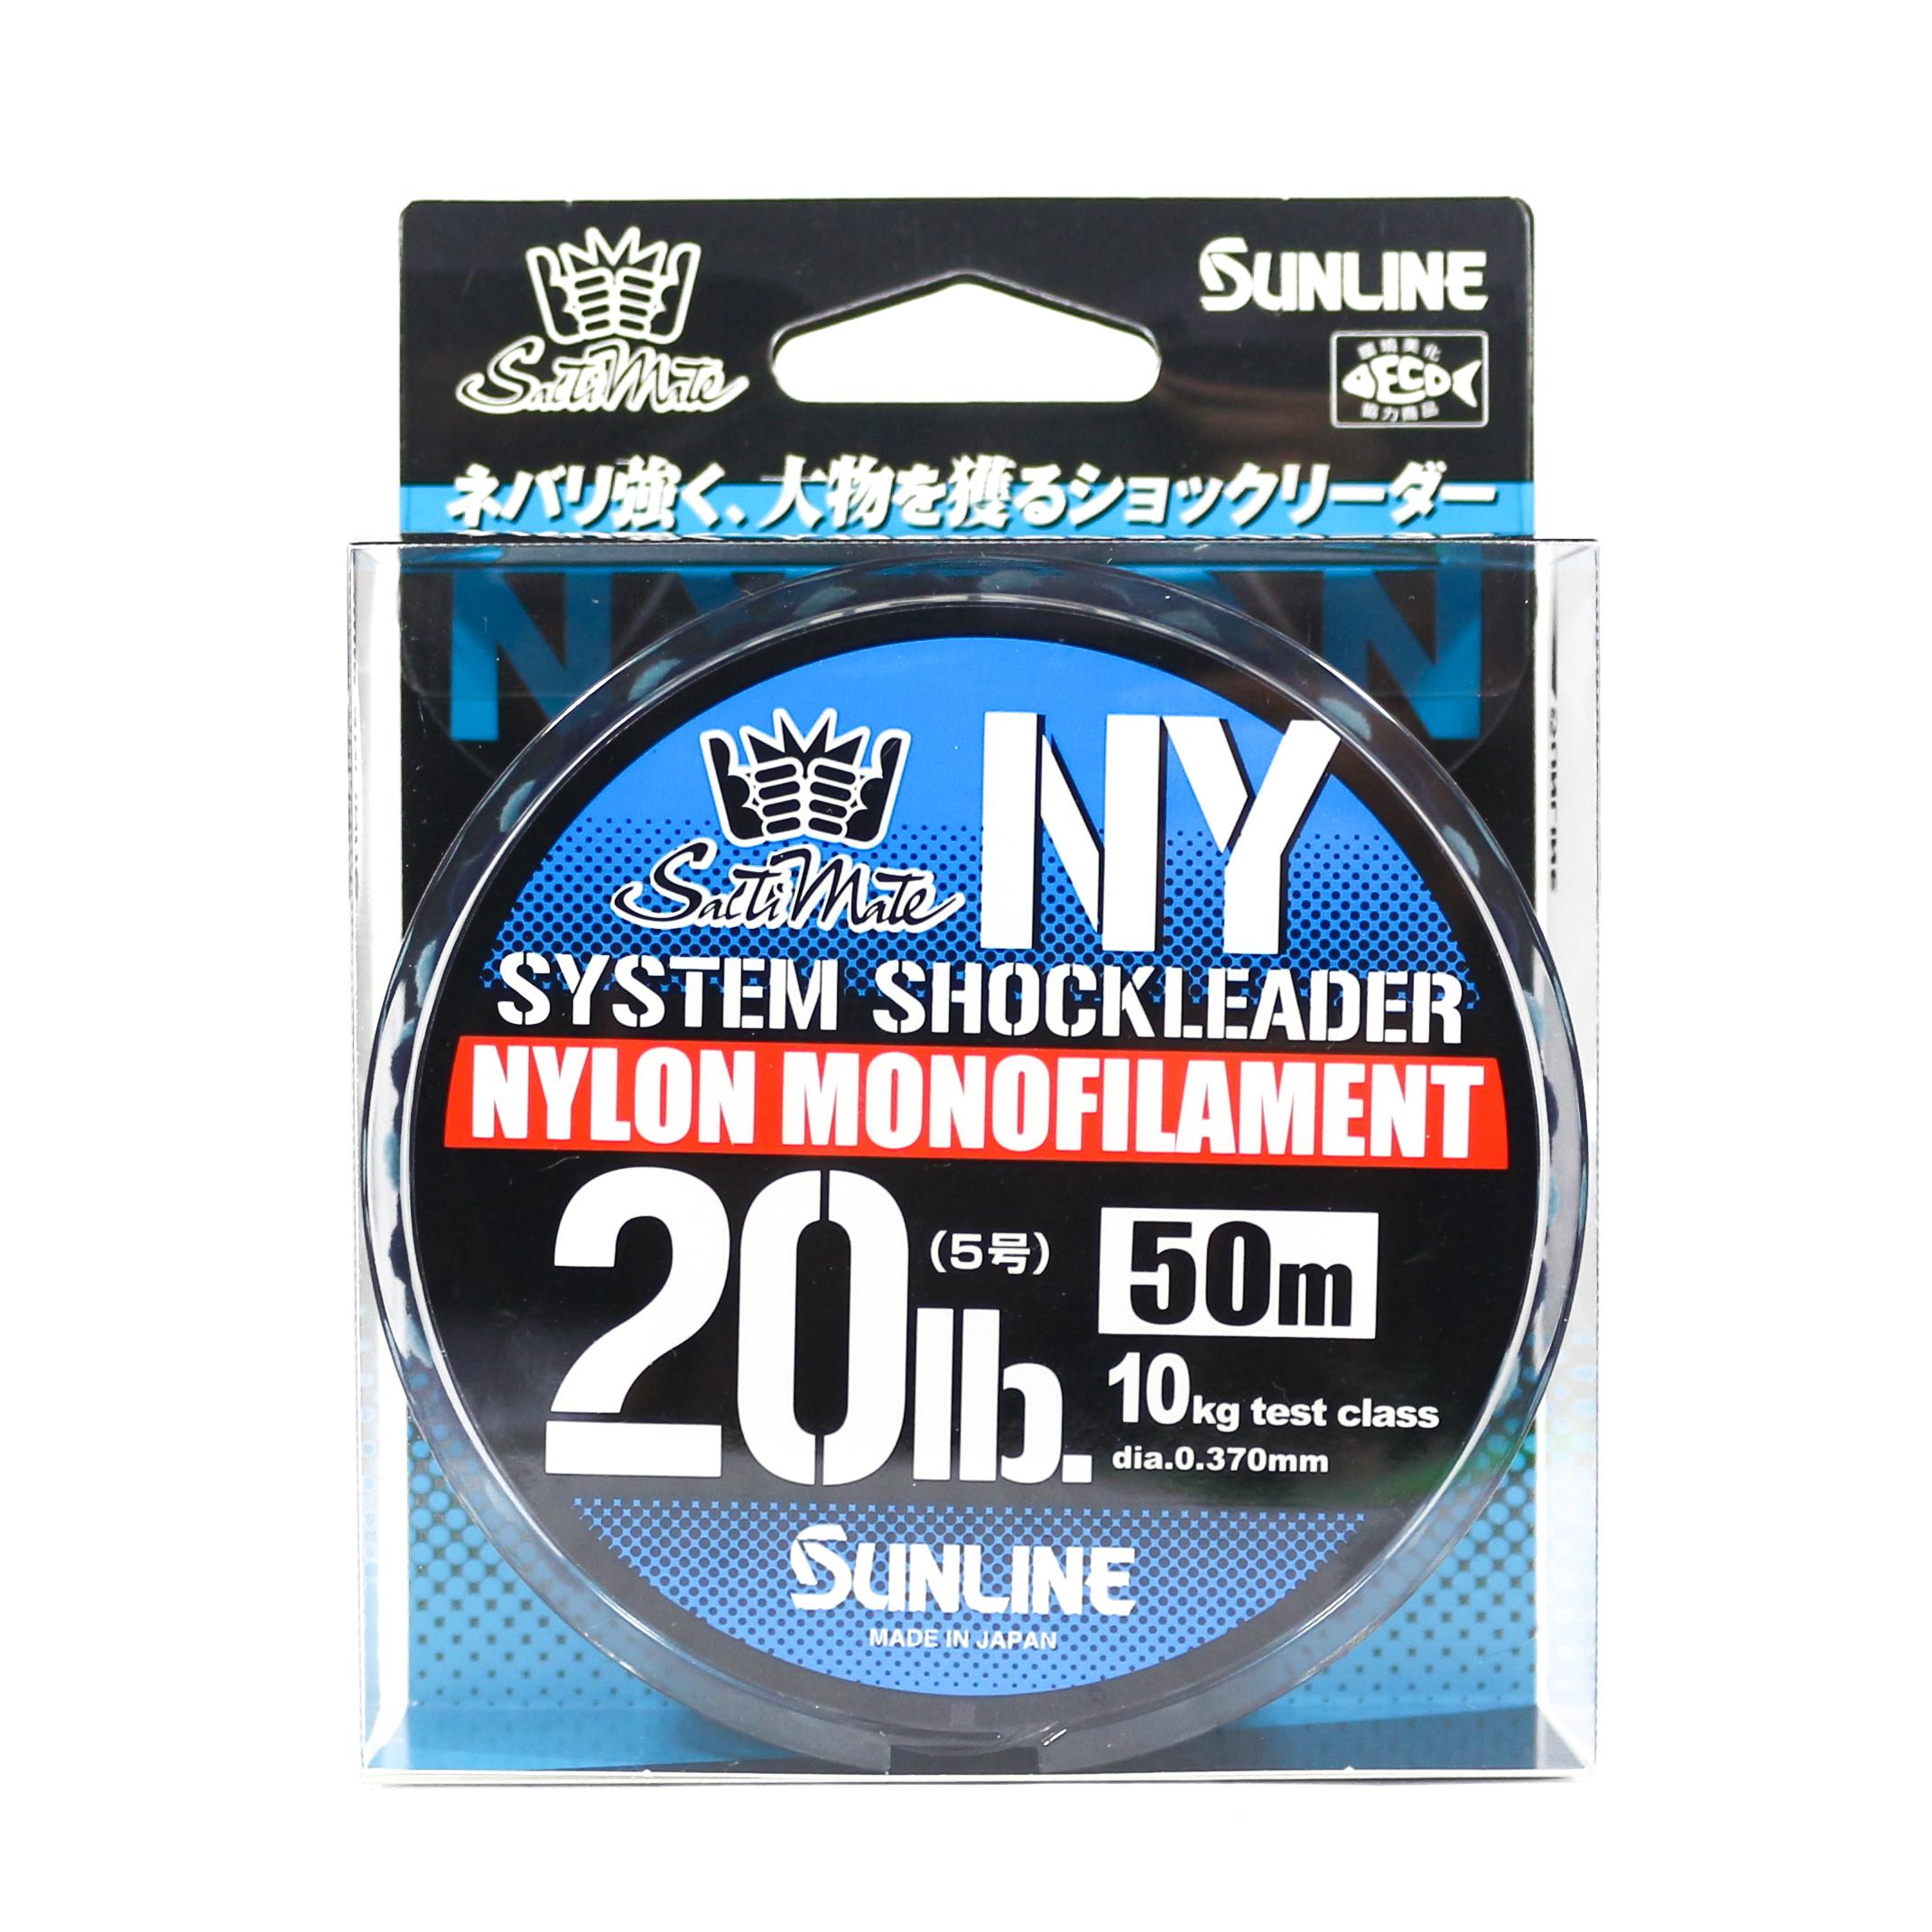 Sunline NY System Shock Leader Nylon 50m 20lb (9284)